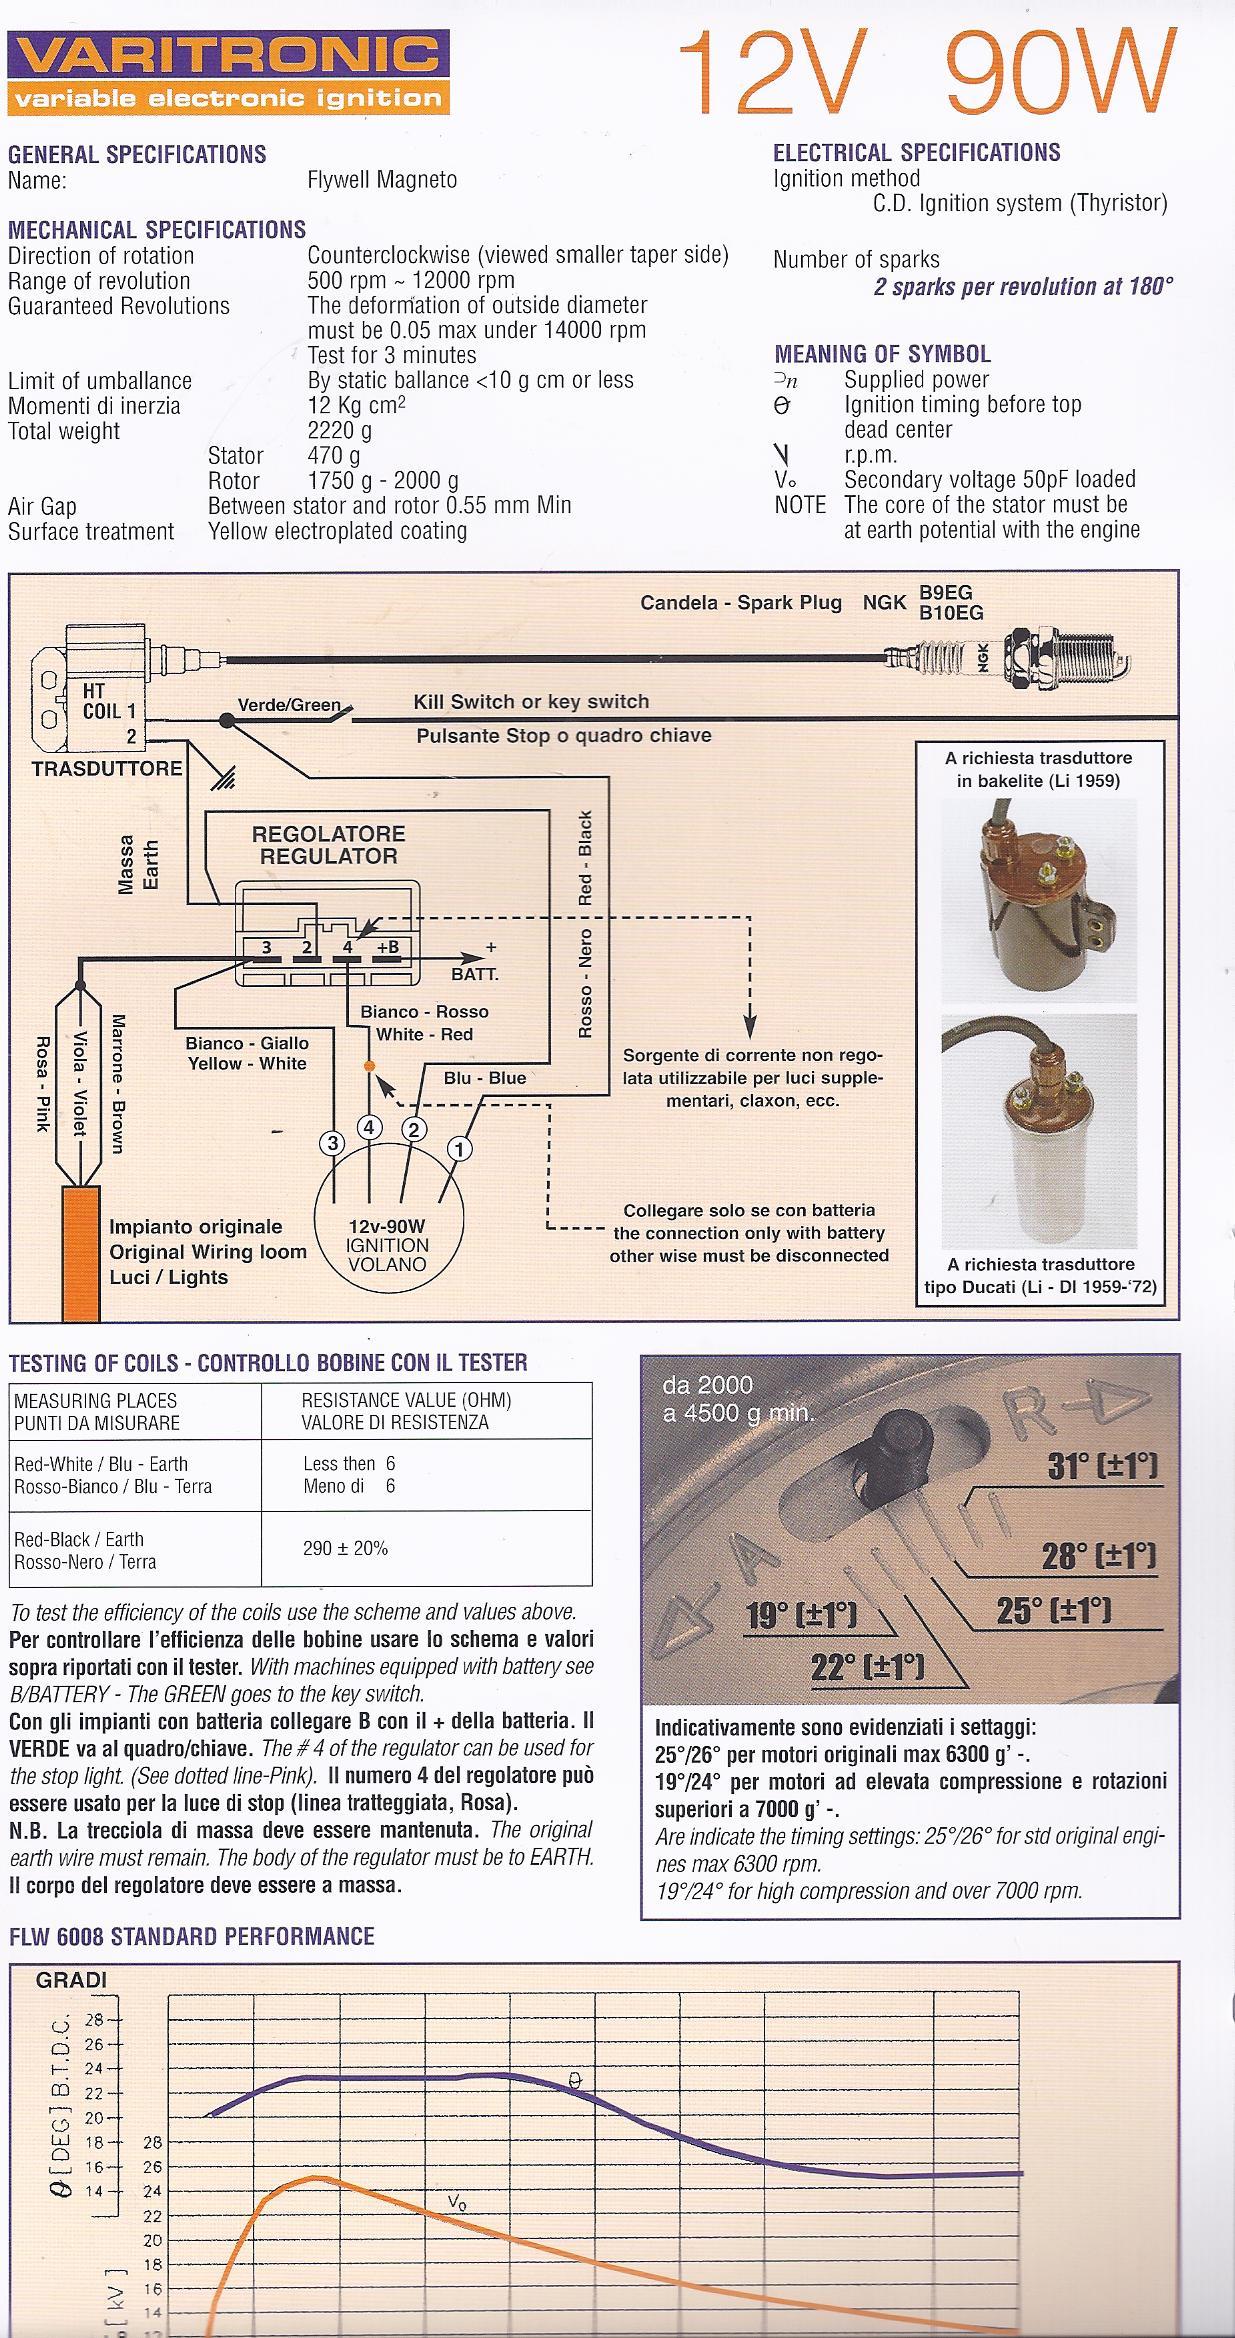 varitronic cambridge lambretta workshops technical help lambretta varitronic wiring diagram at fashall.co